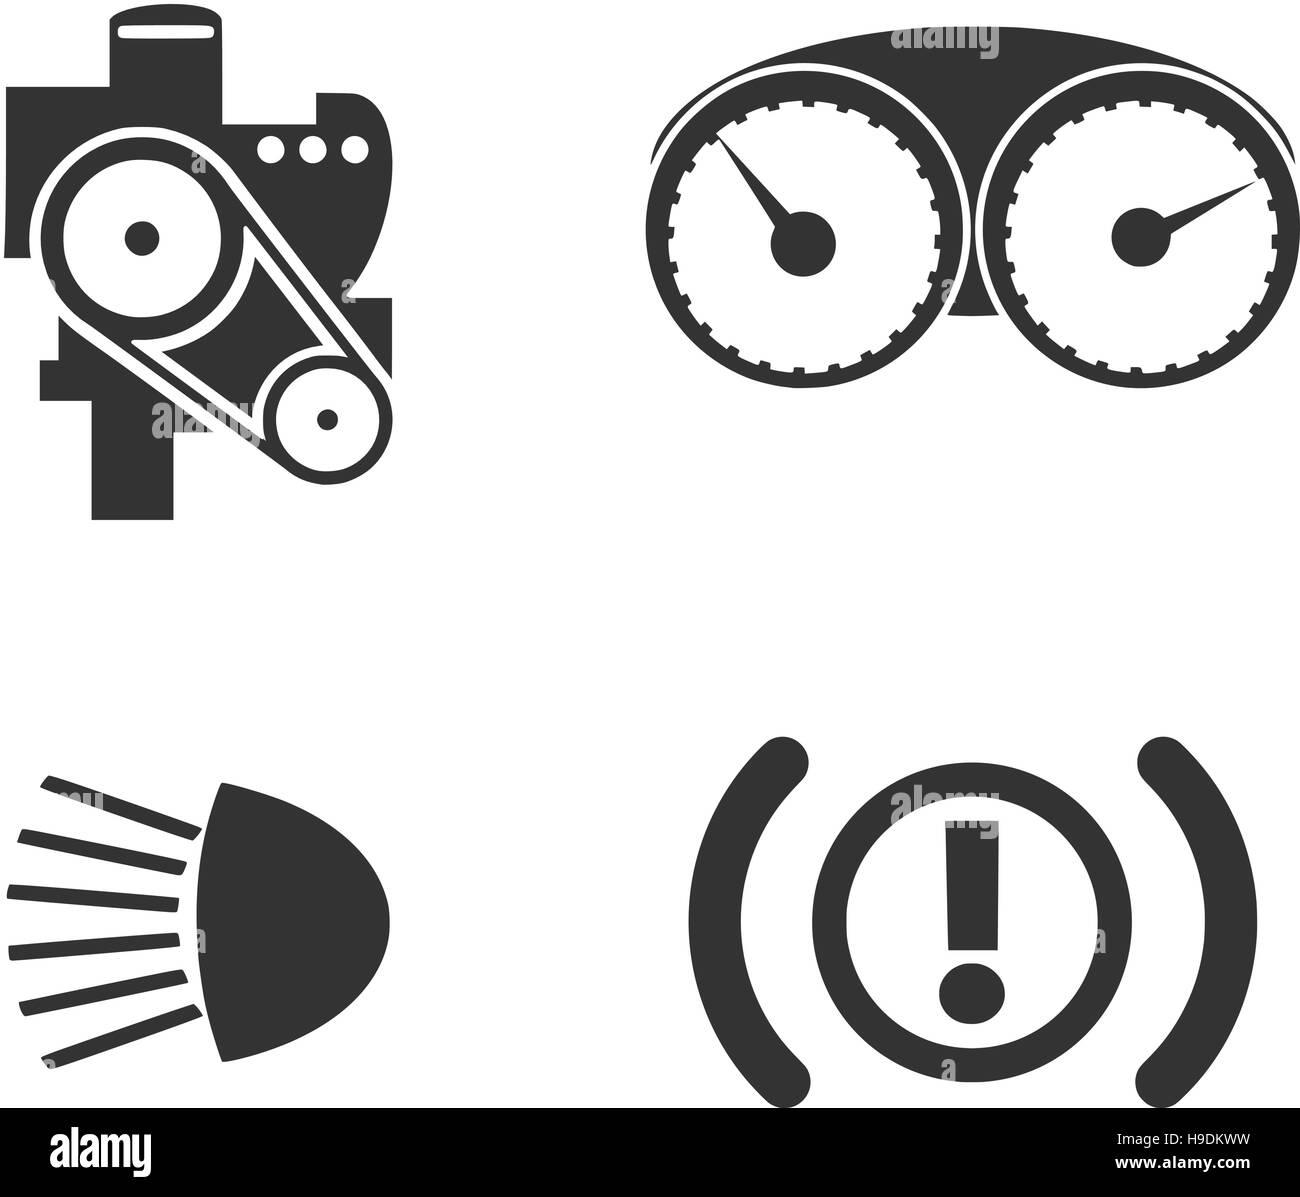 Auto-Rahmen-set Vektor Abbildung - Bild: 126305477 - Alamy